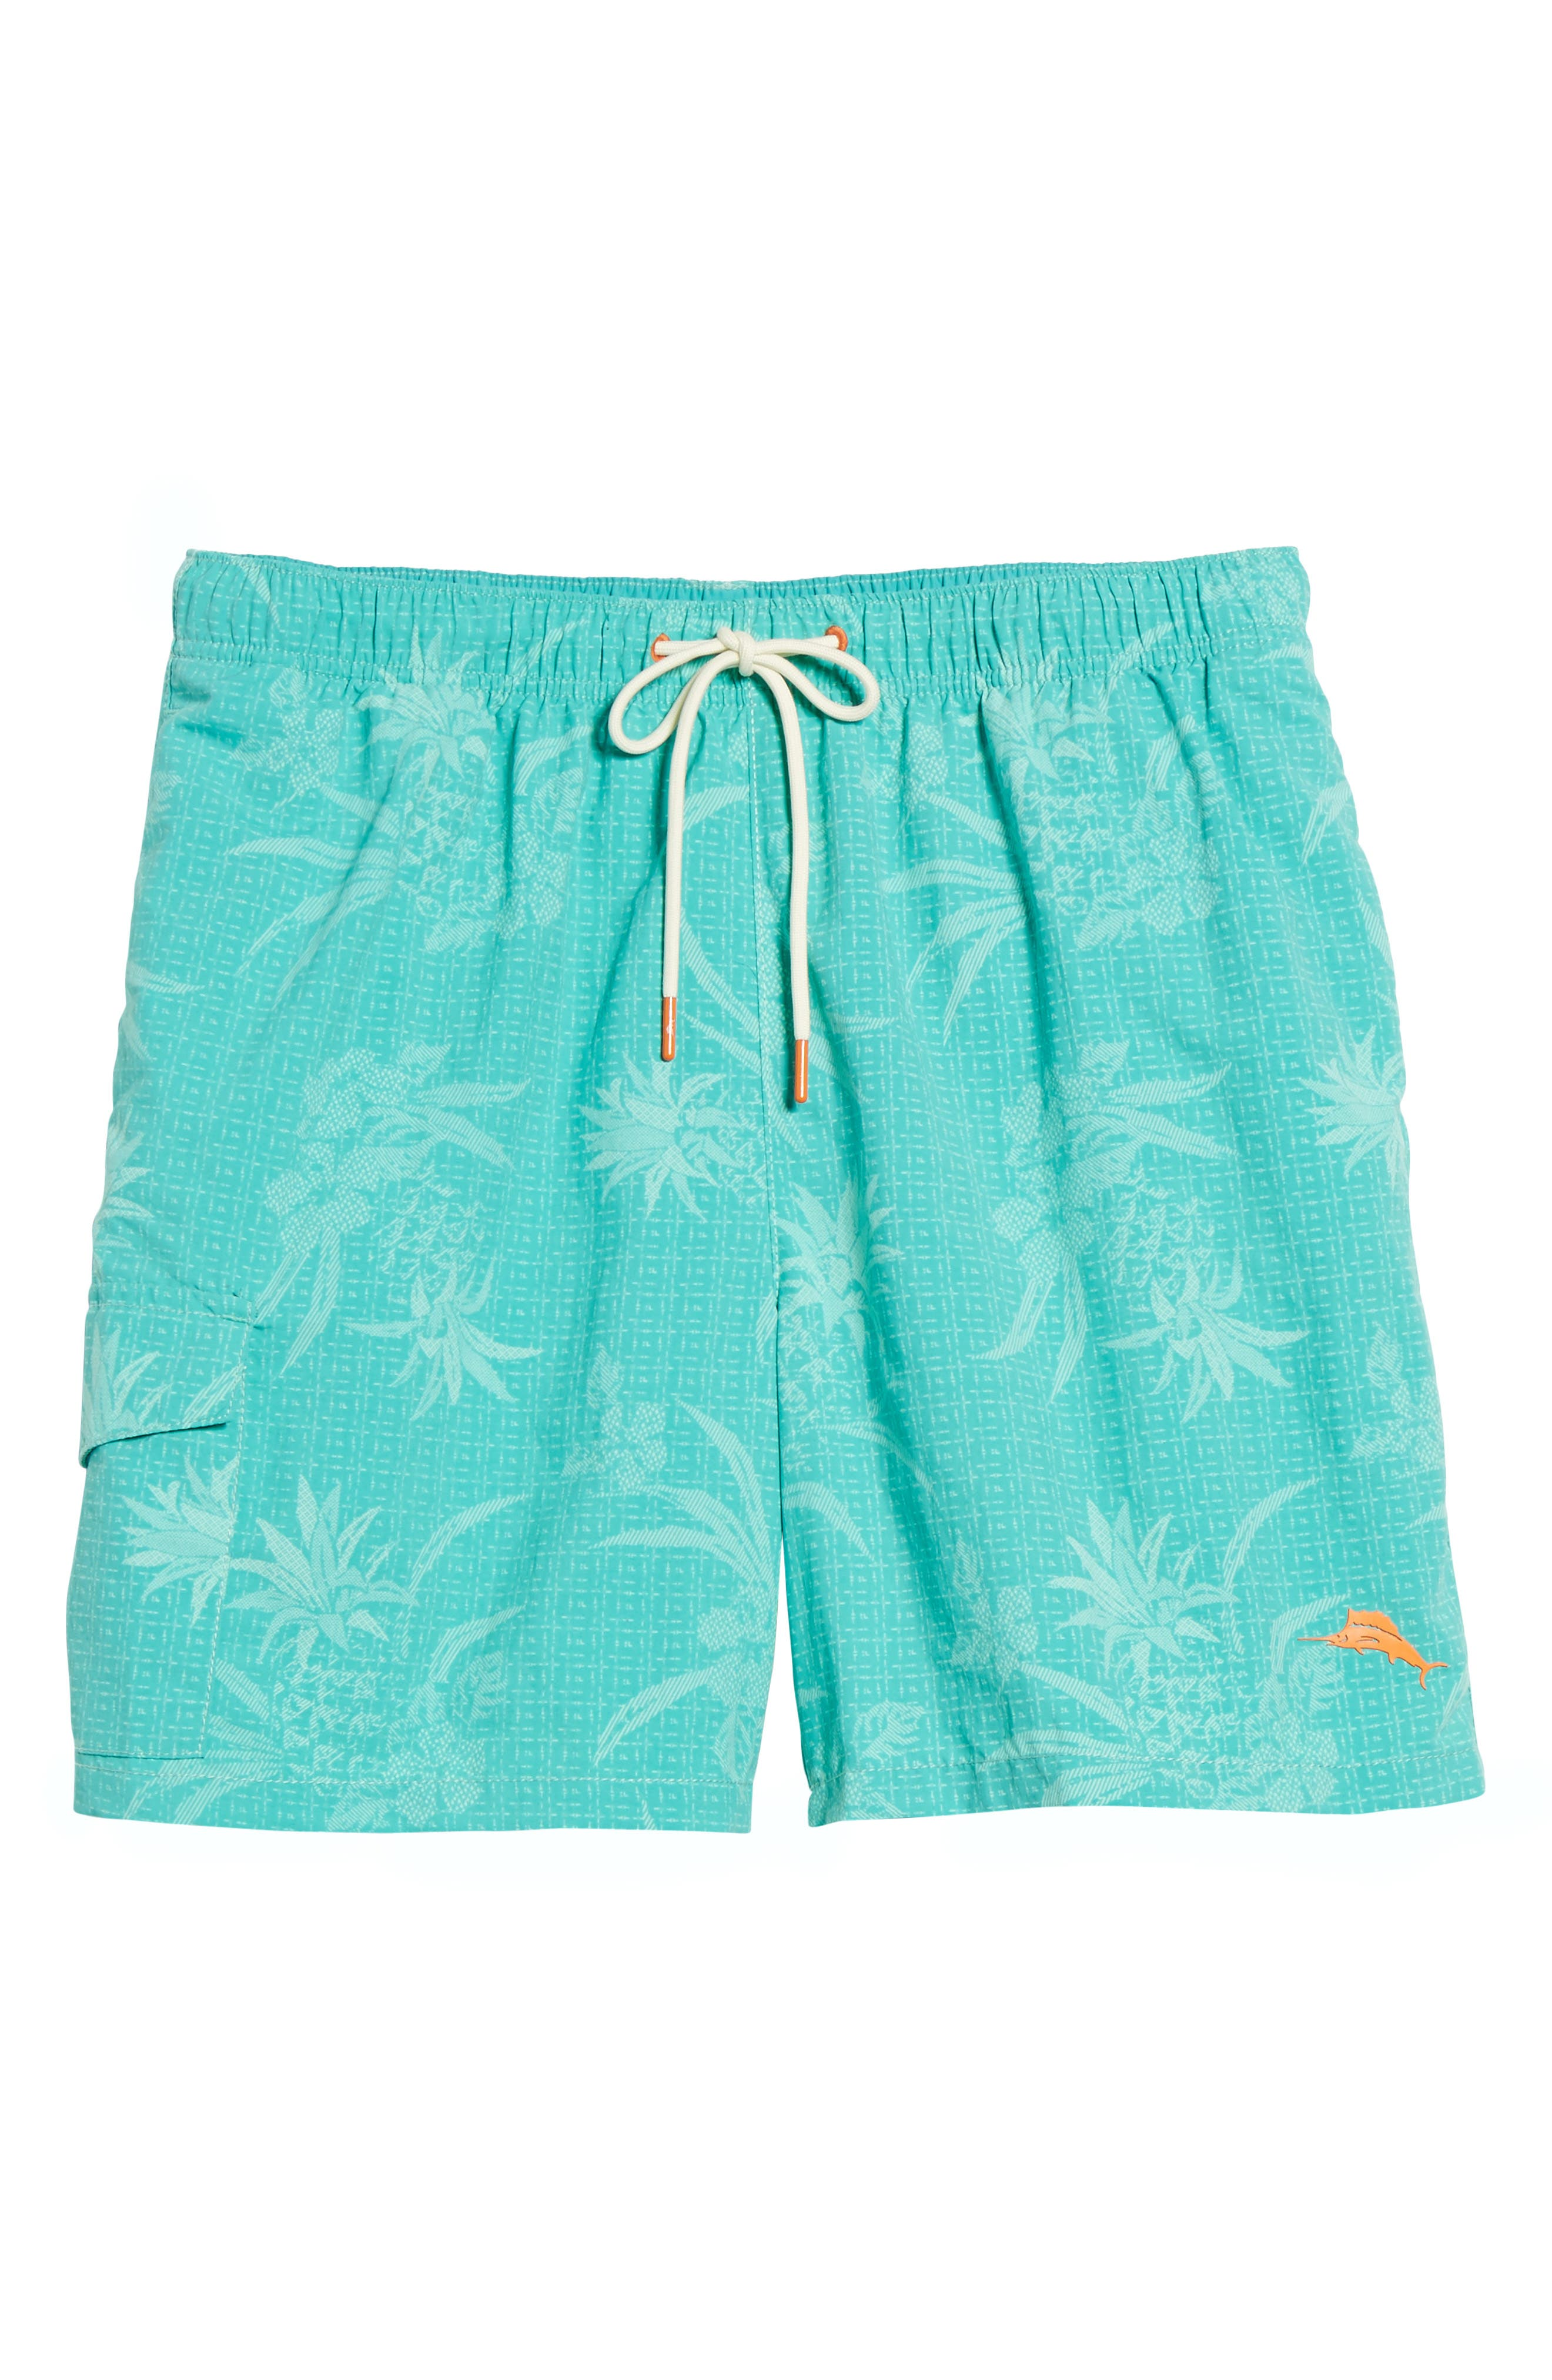 Naples Huli Pineapple Swim Trunks,                             Alternate thumbnail 6, color,                             Castaway Green